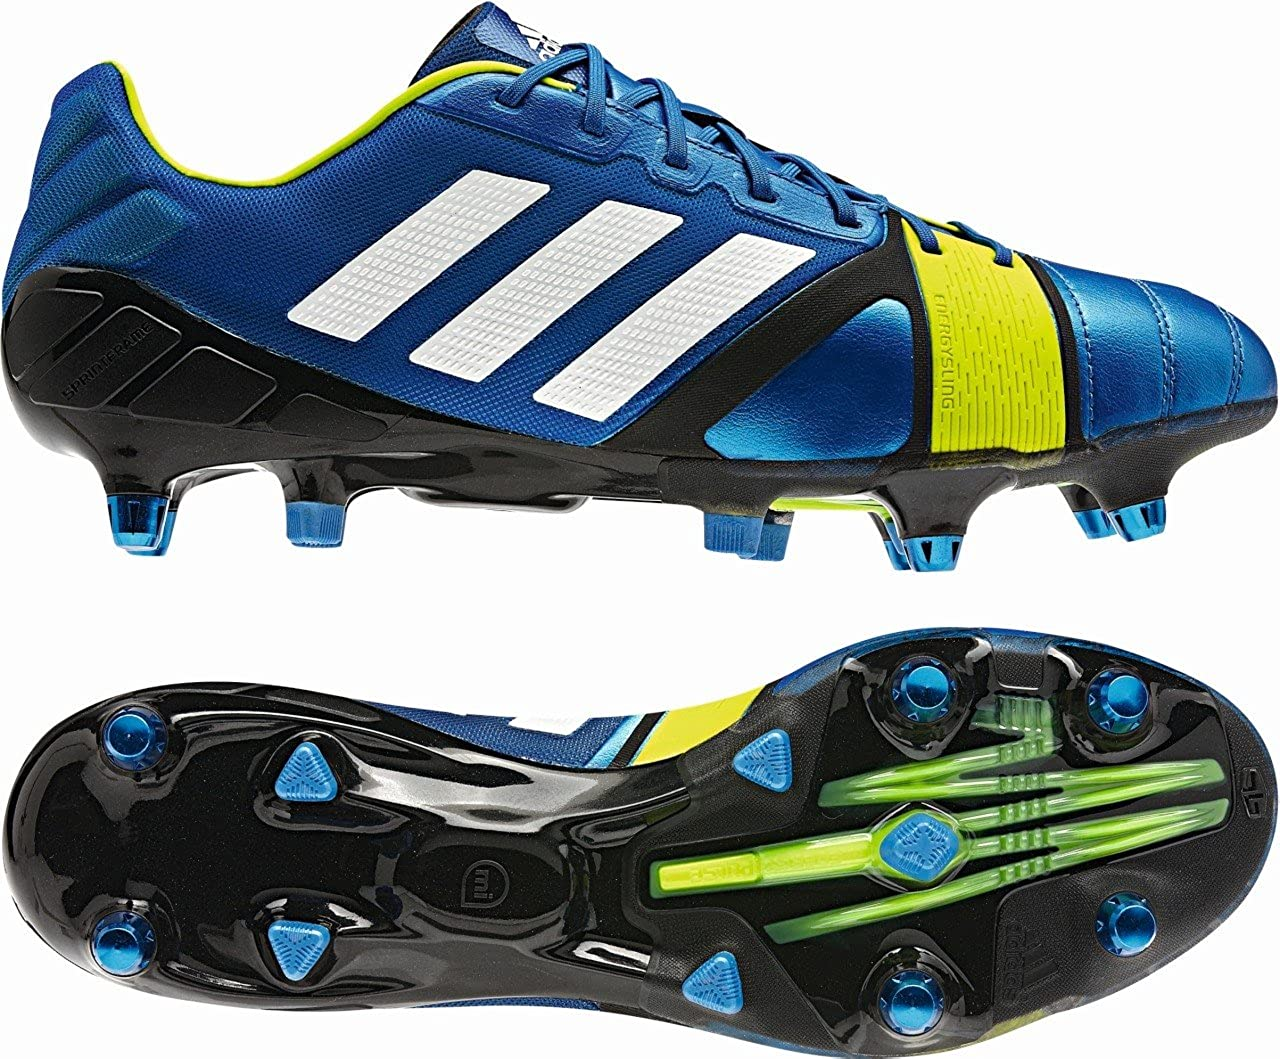 promo code 72f35 3e49a adidas Nitrocharge 1.0 XTRX SG Football Shoe Men Amazon.co.uk Sports   Outdoors